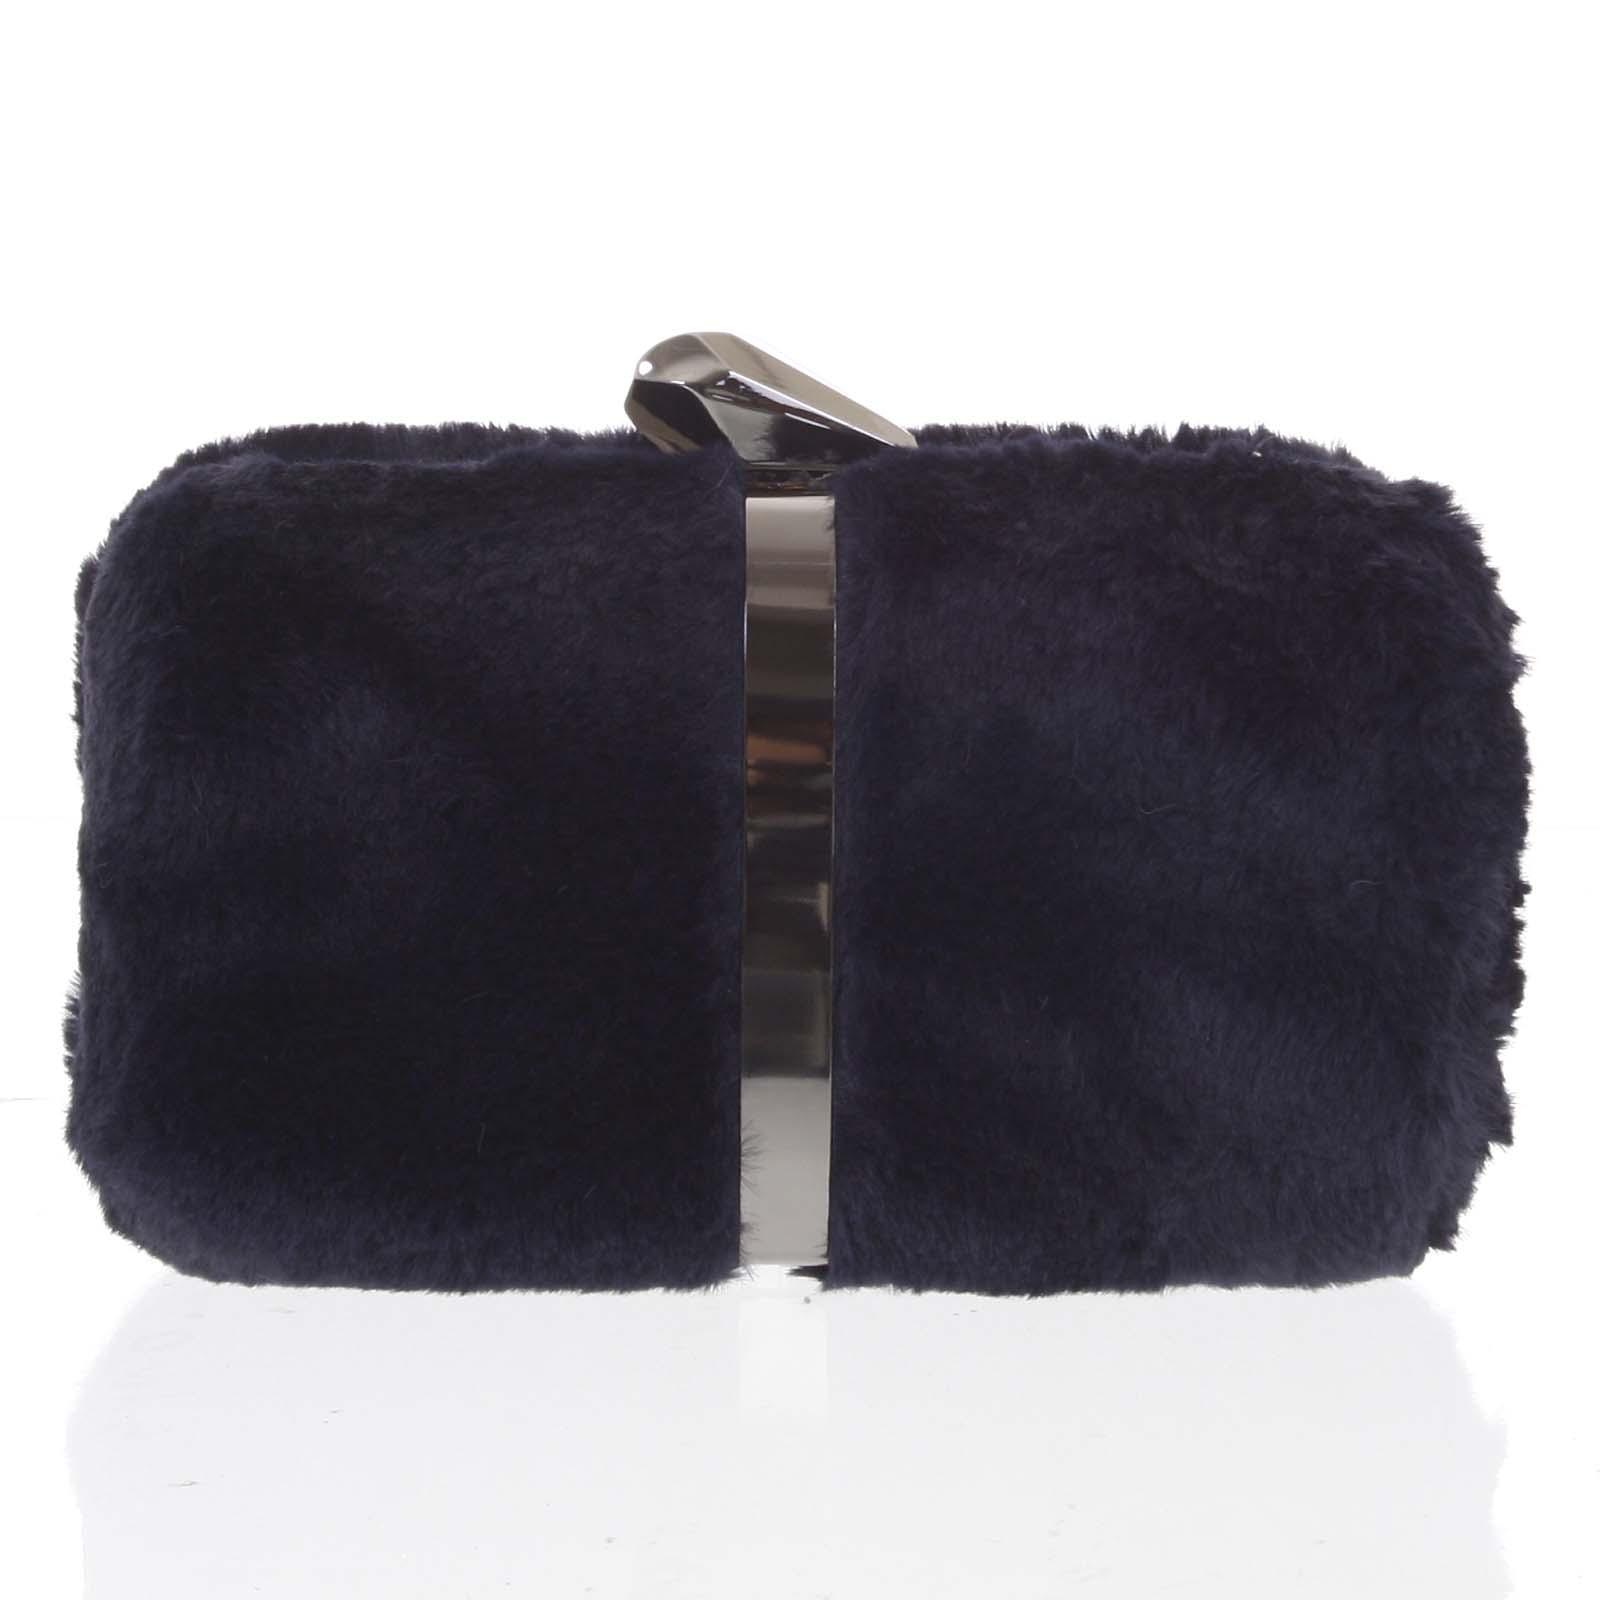 Originálna dámska tmavomodrá plyšová listová kabelka - Delami